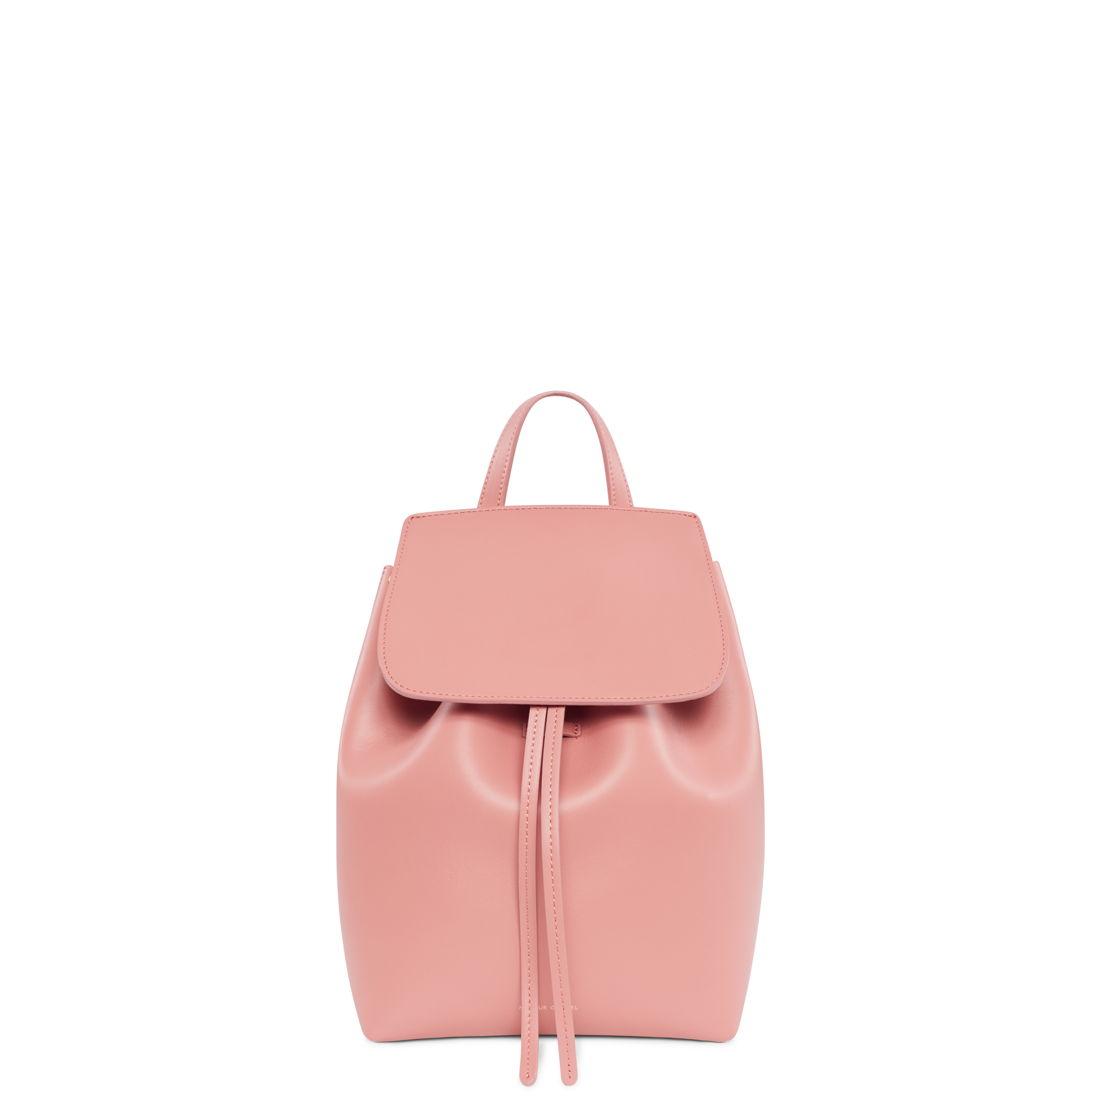 Mansur Gavriel Mini Backpack Calf Blush at Graanmarkt 13